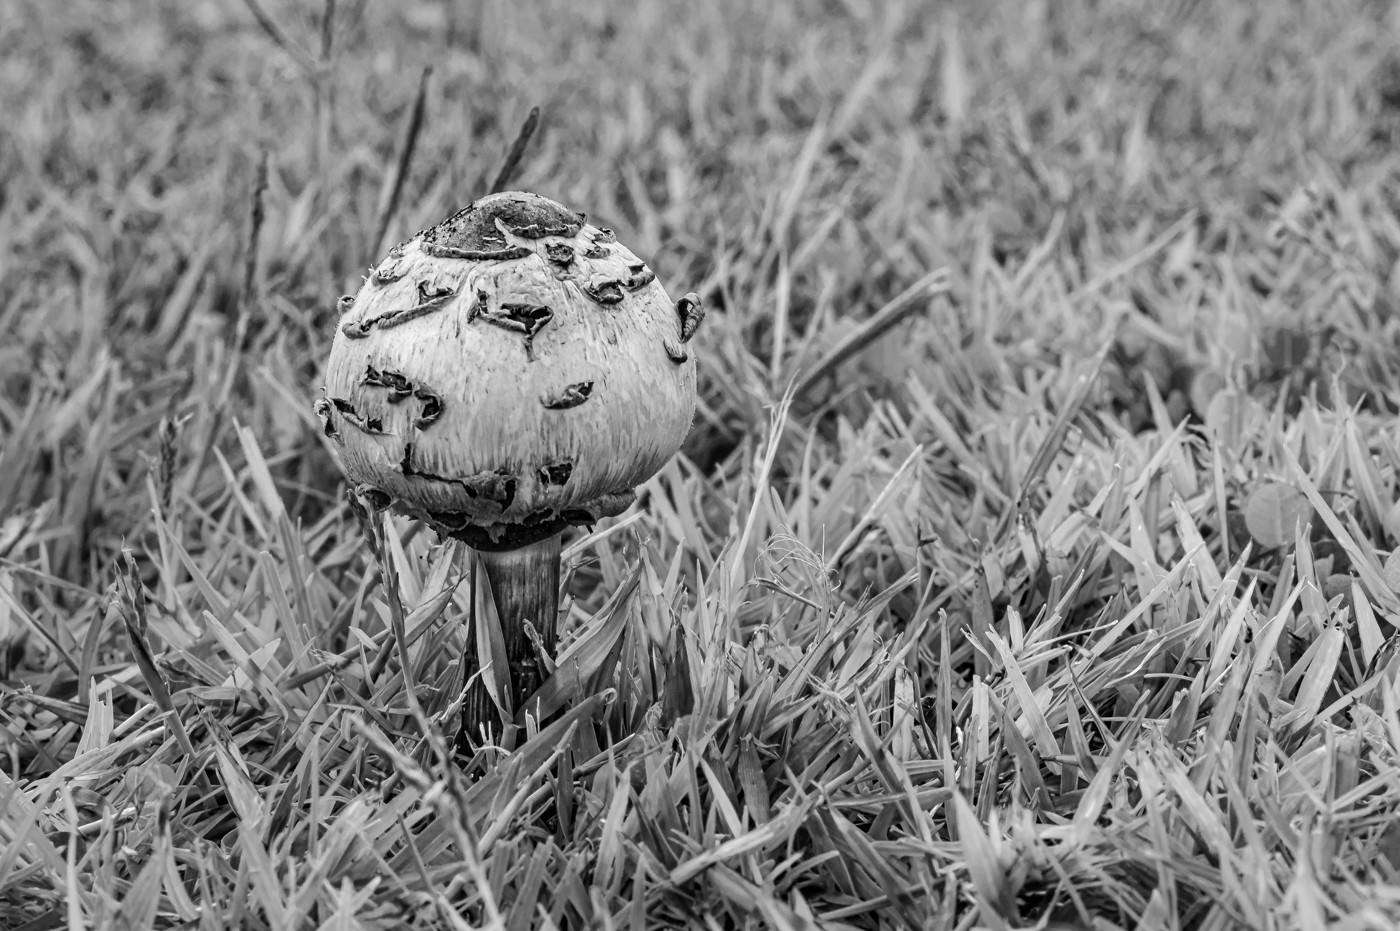 Rosemarie Edwards - Fungus in a field